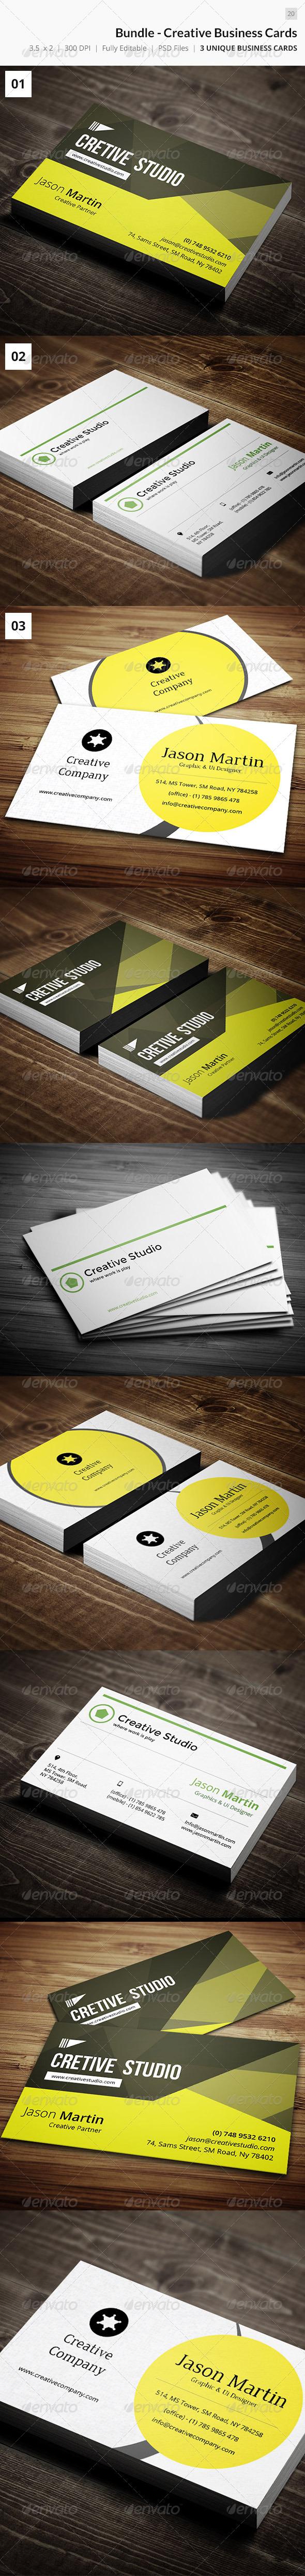 Bundle - Creative Business Cards 20 - Creative Business Cards